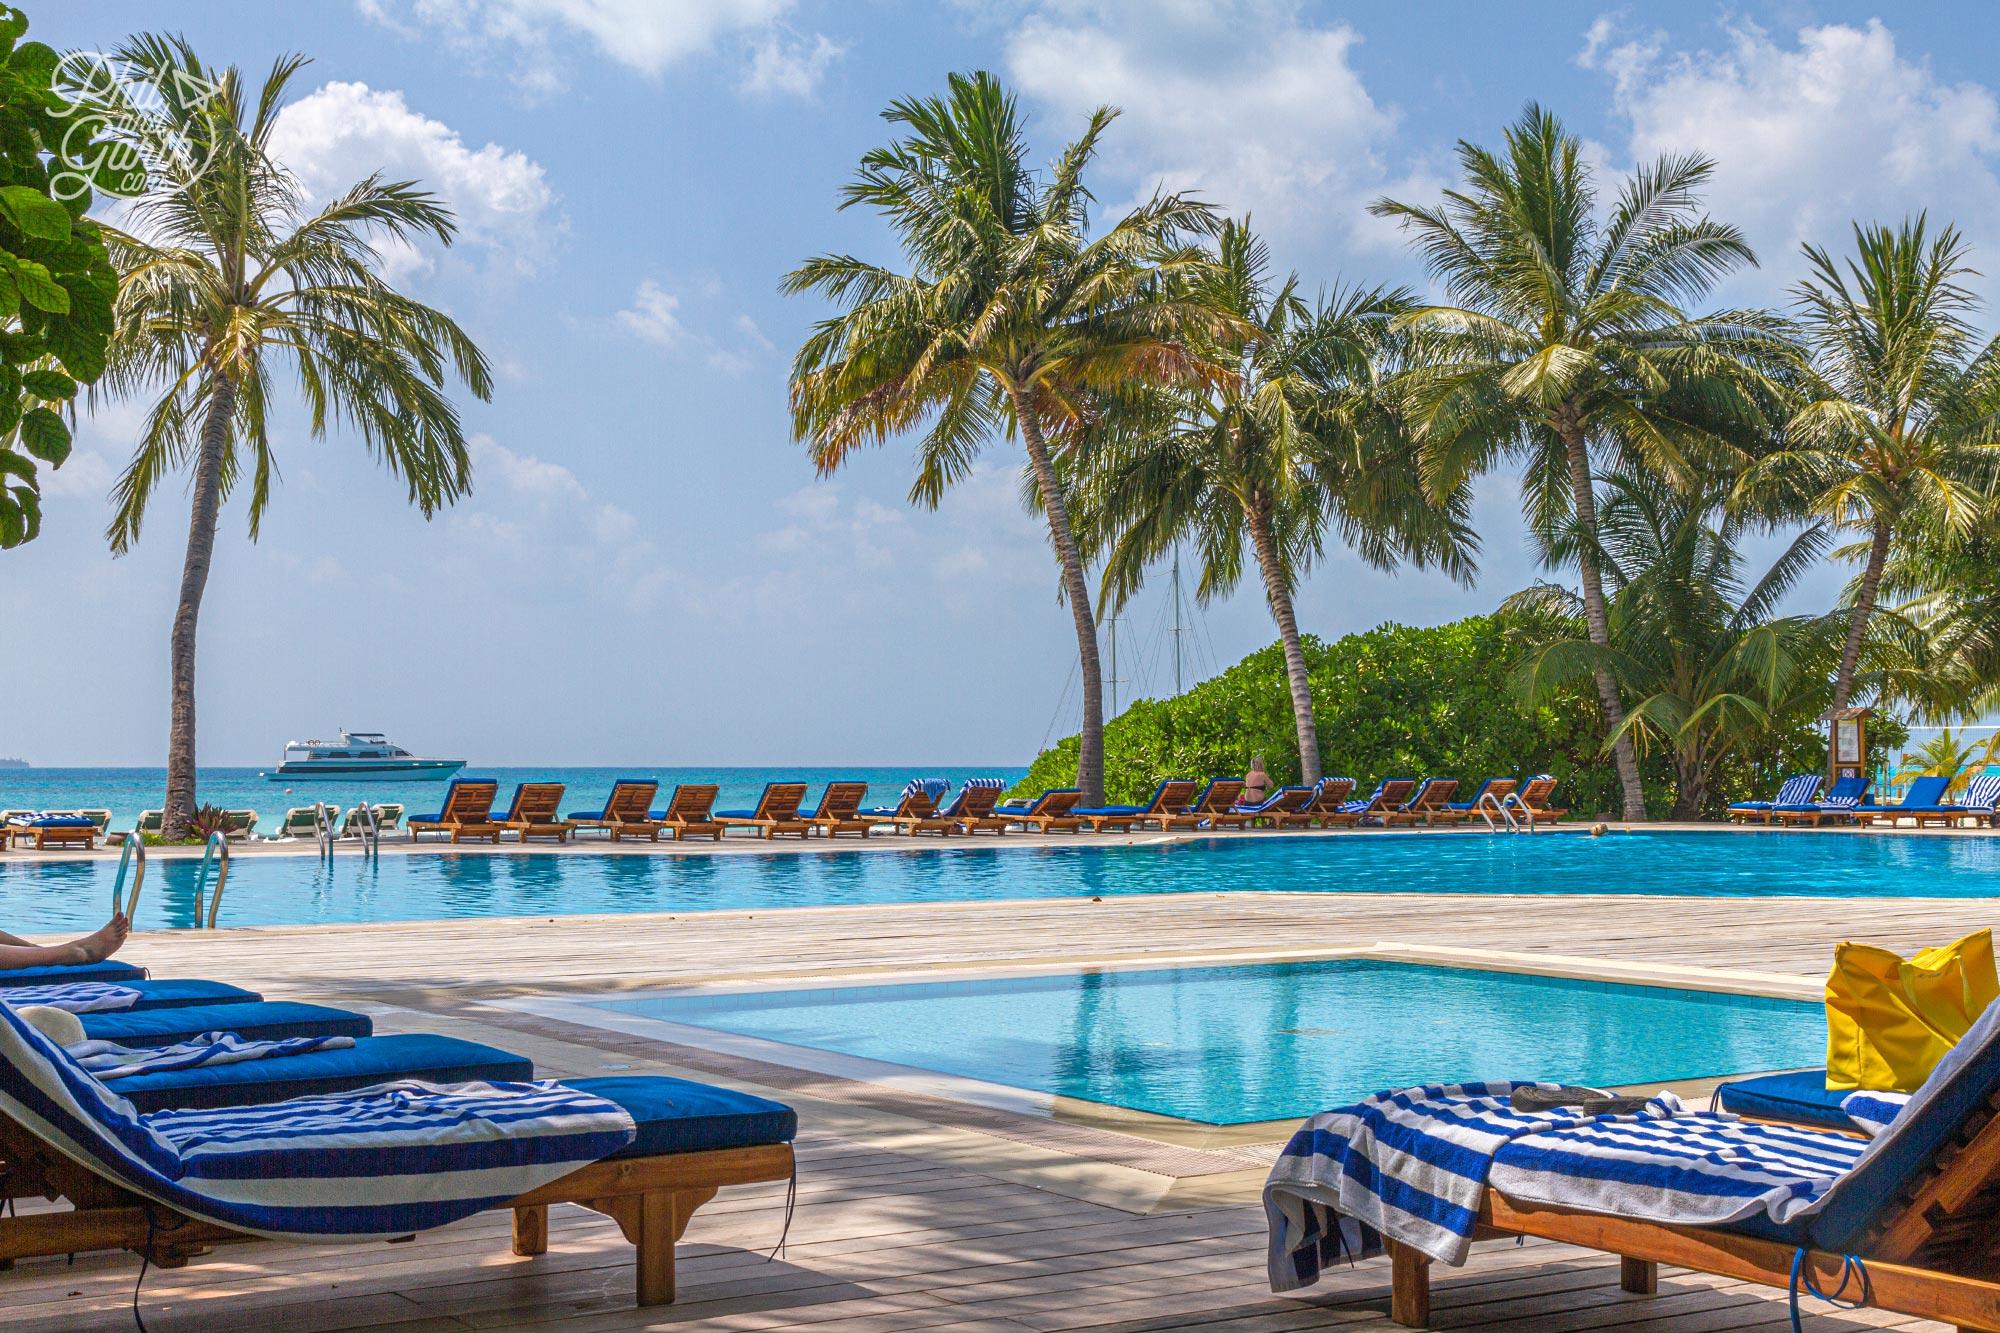 The Dhoni fresh water swimming pool